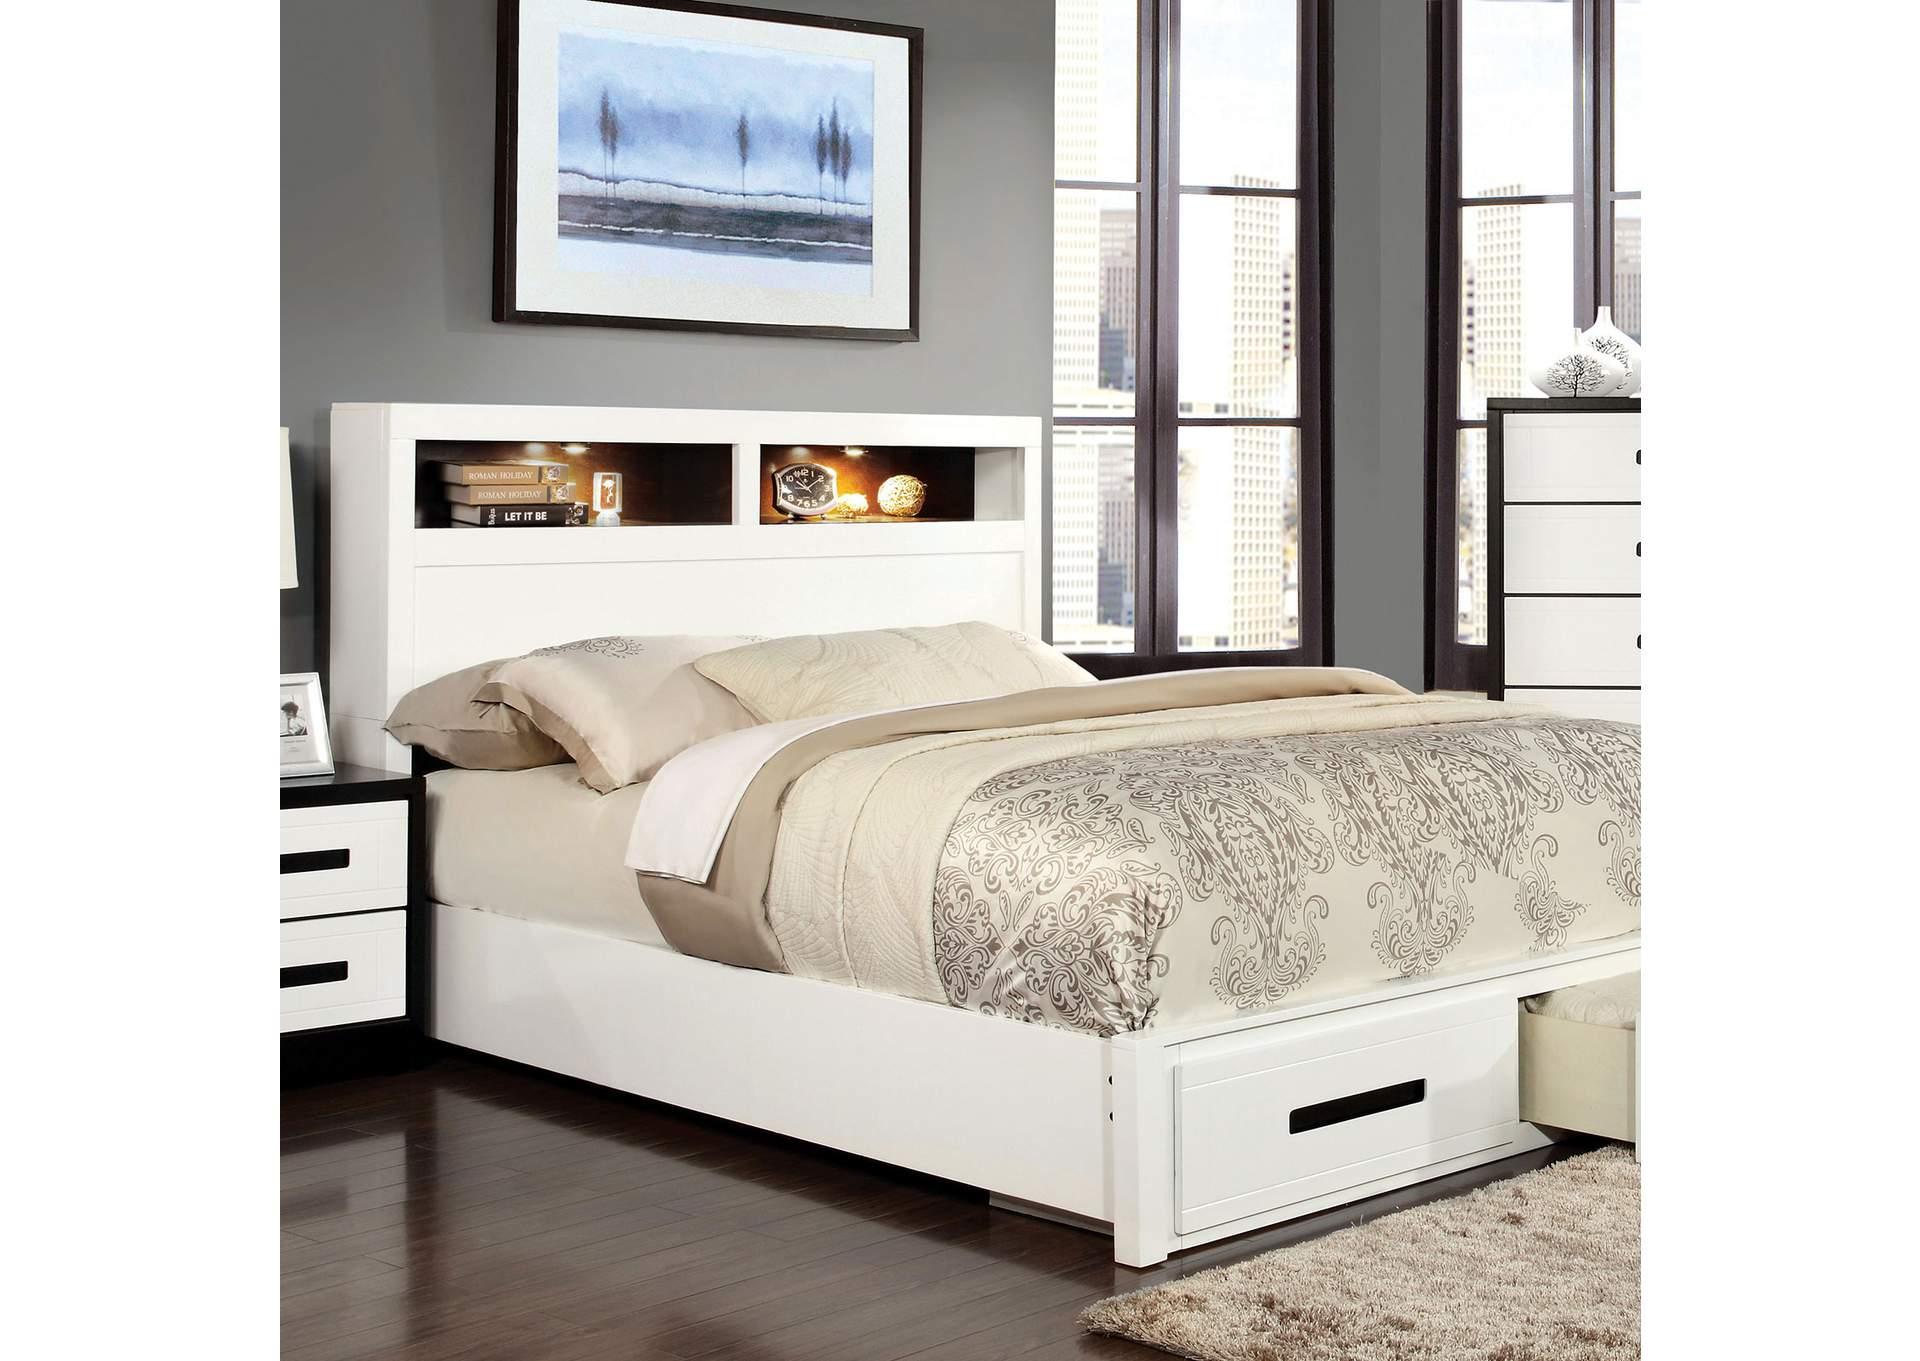 Furniture liquidators baton rouge la rutger white for Furniture and mattress liquidators baton rouge